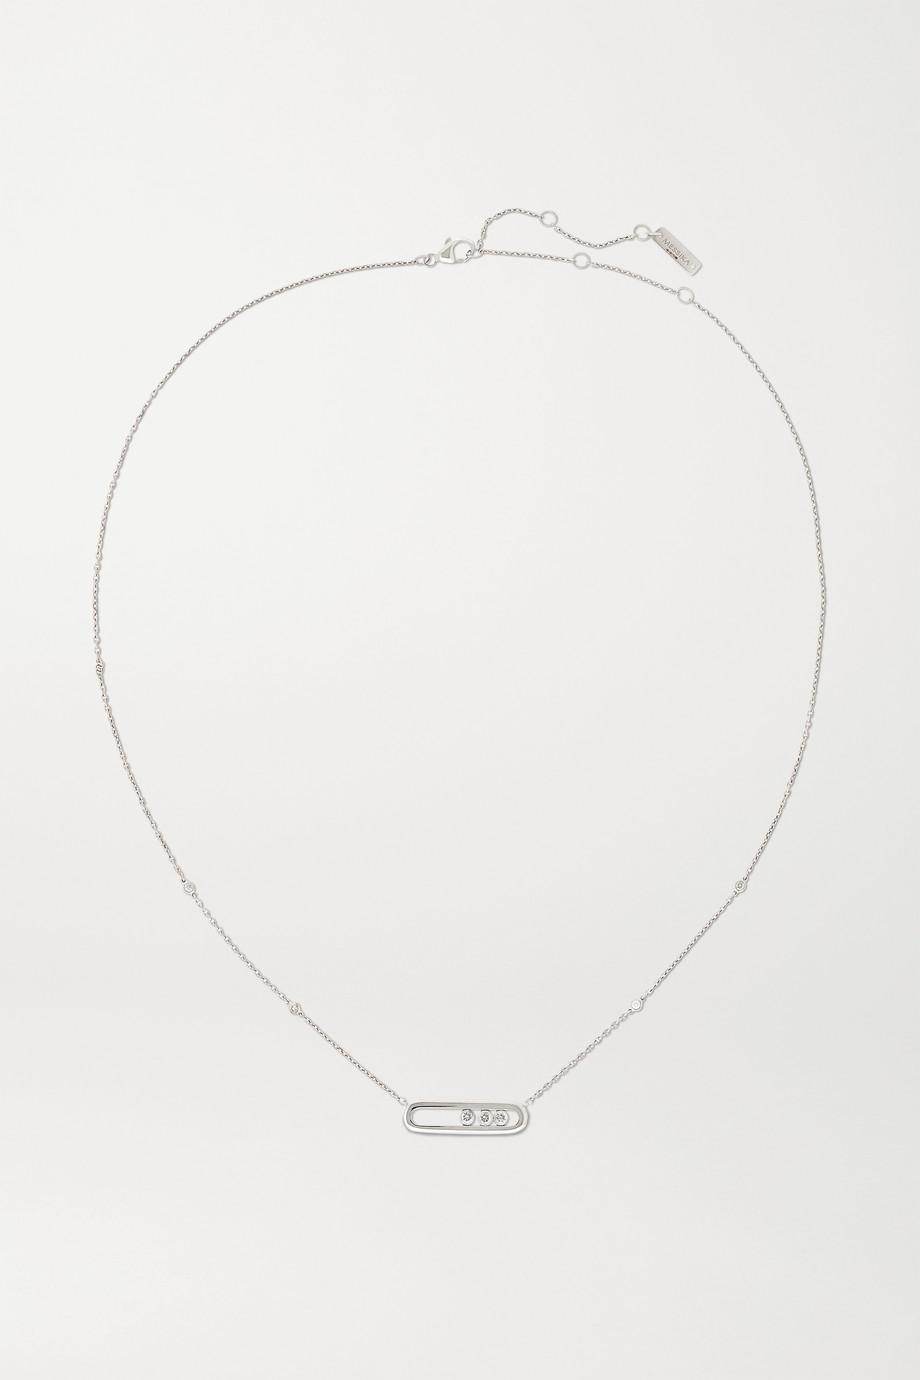 Messika Baby Move 18-karat white gold diamond necklace